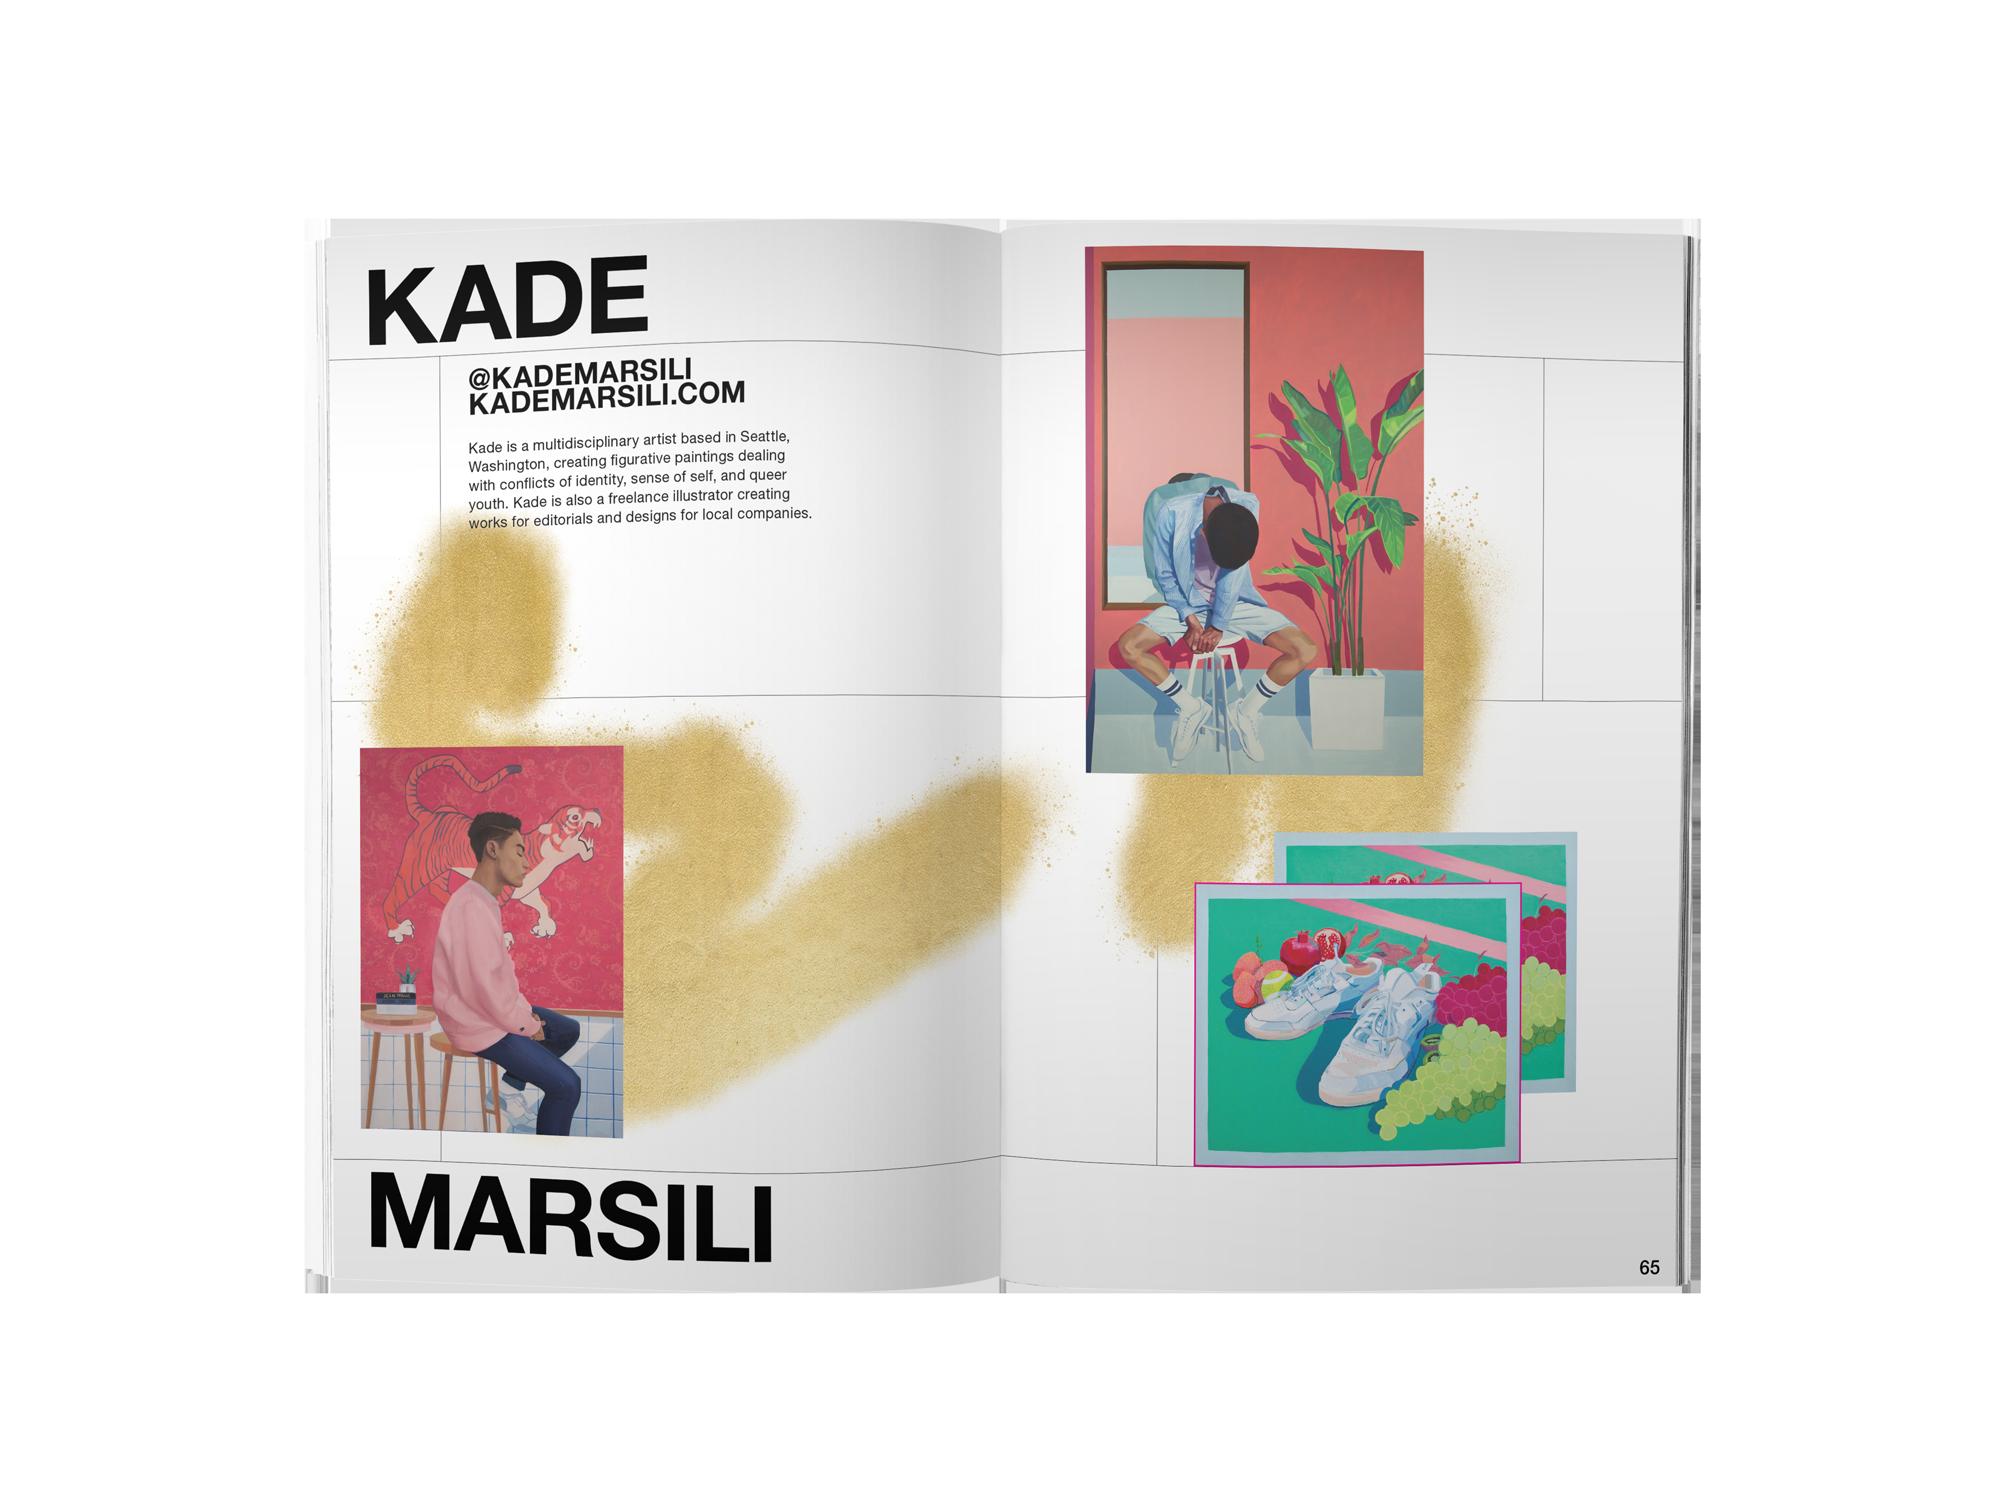 kade-marsili.png